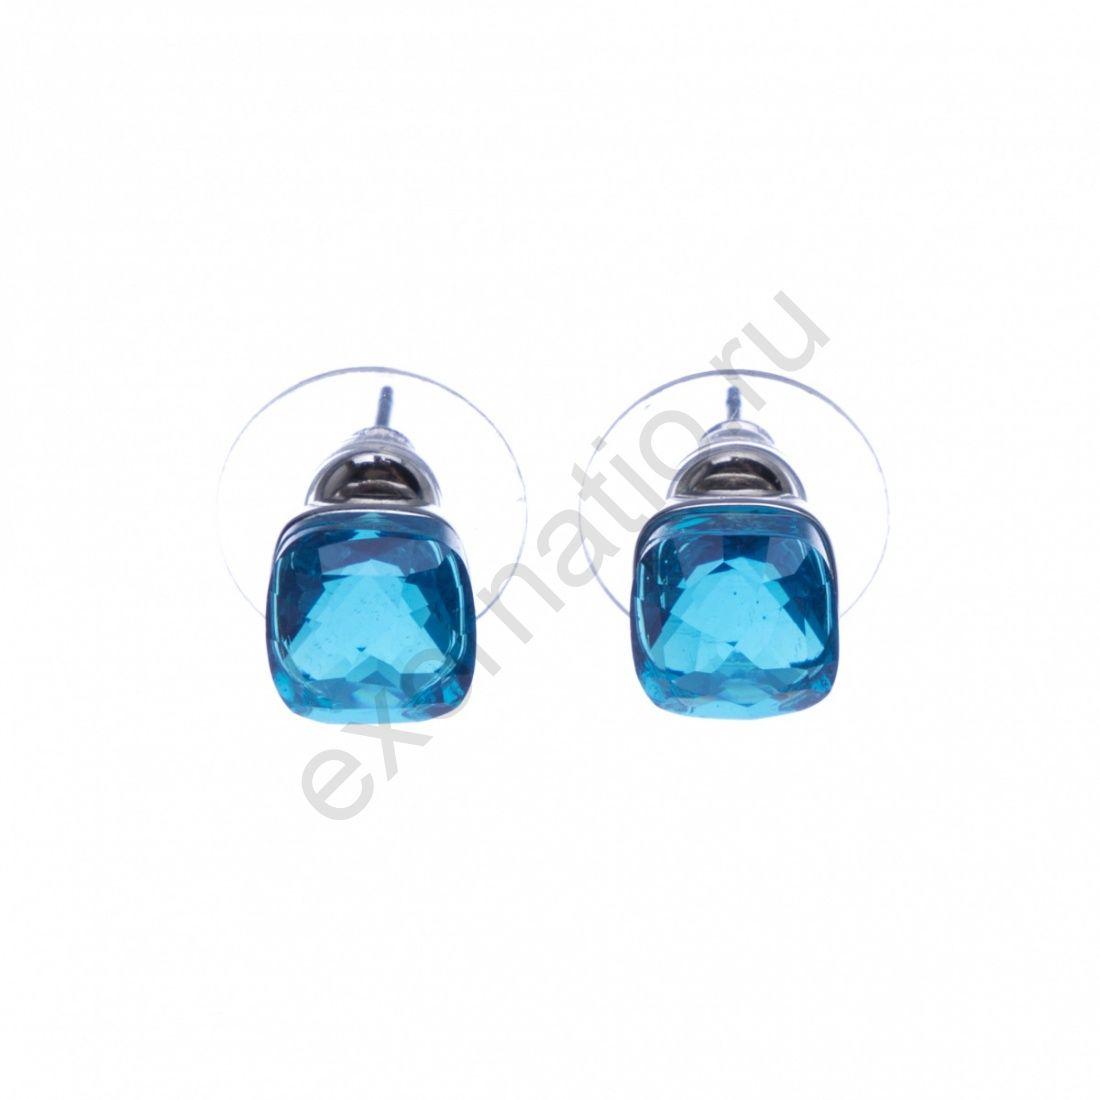 Серьги Fiore Luna 14A26EP002 XH101 BL/BW